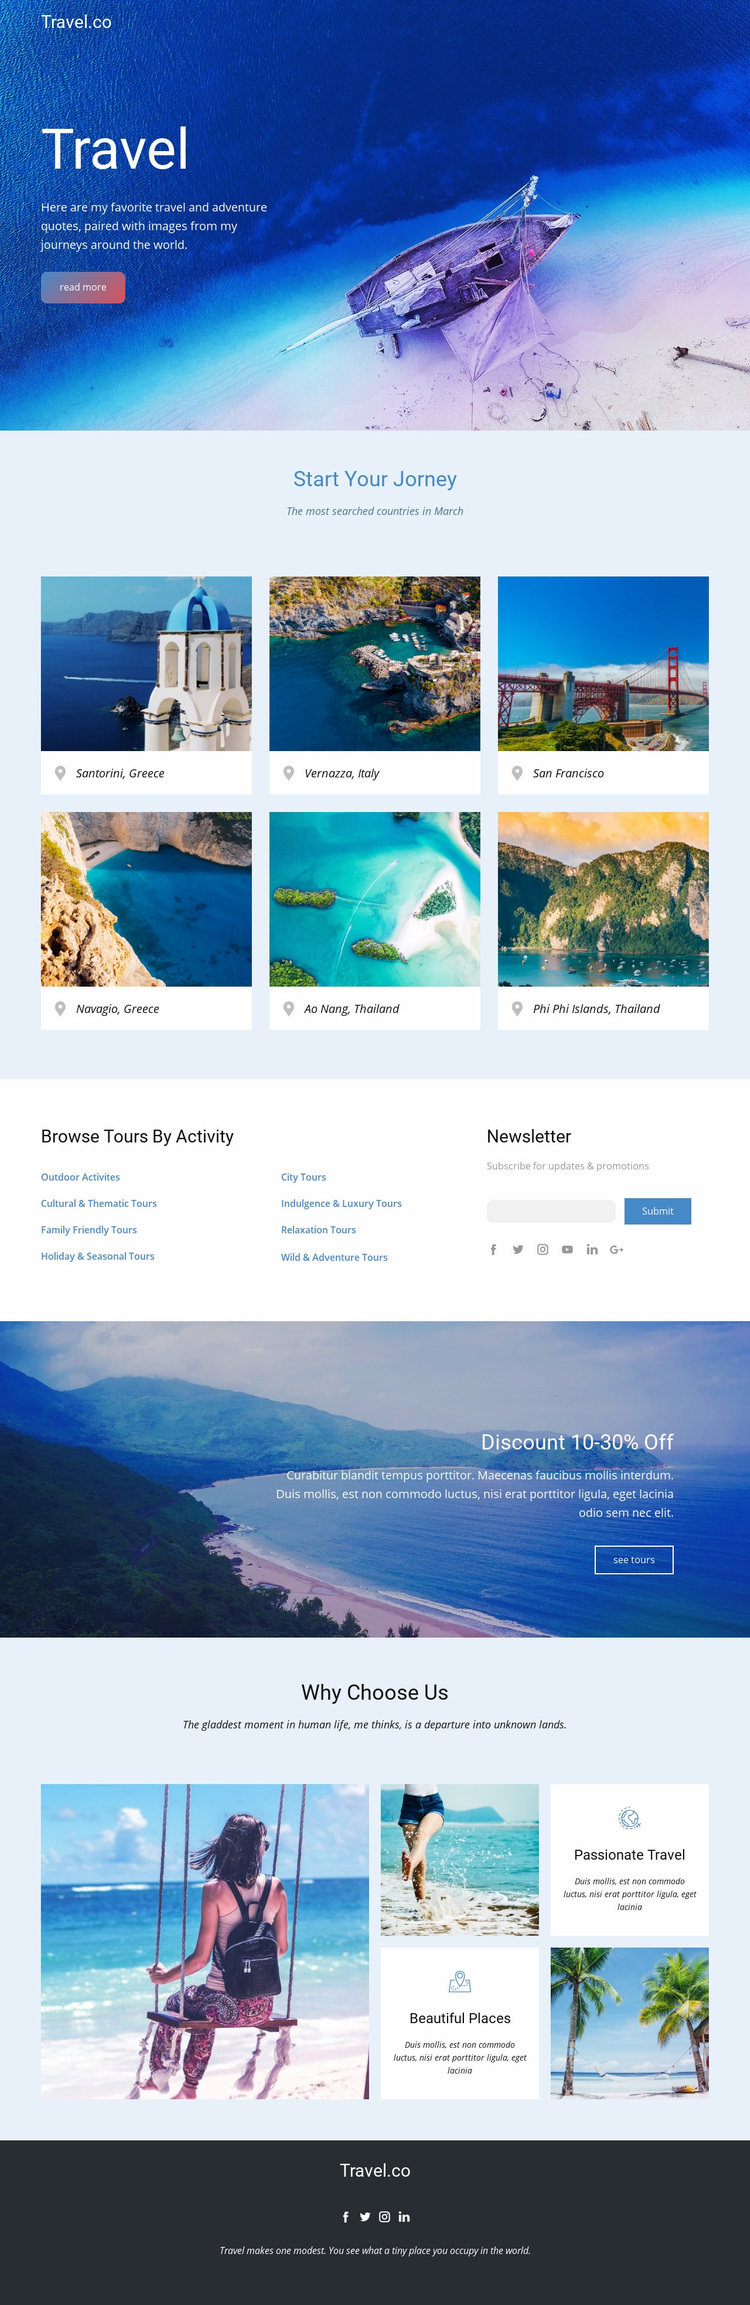 Amazing ideas for travel Web Page Designer